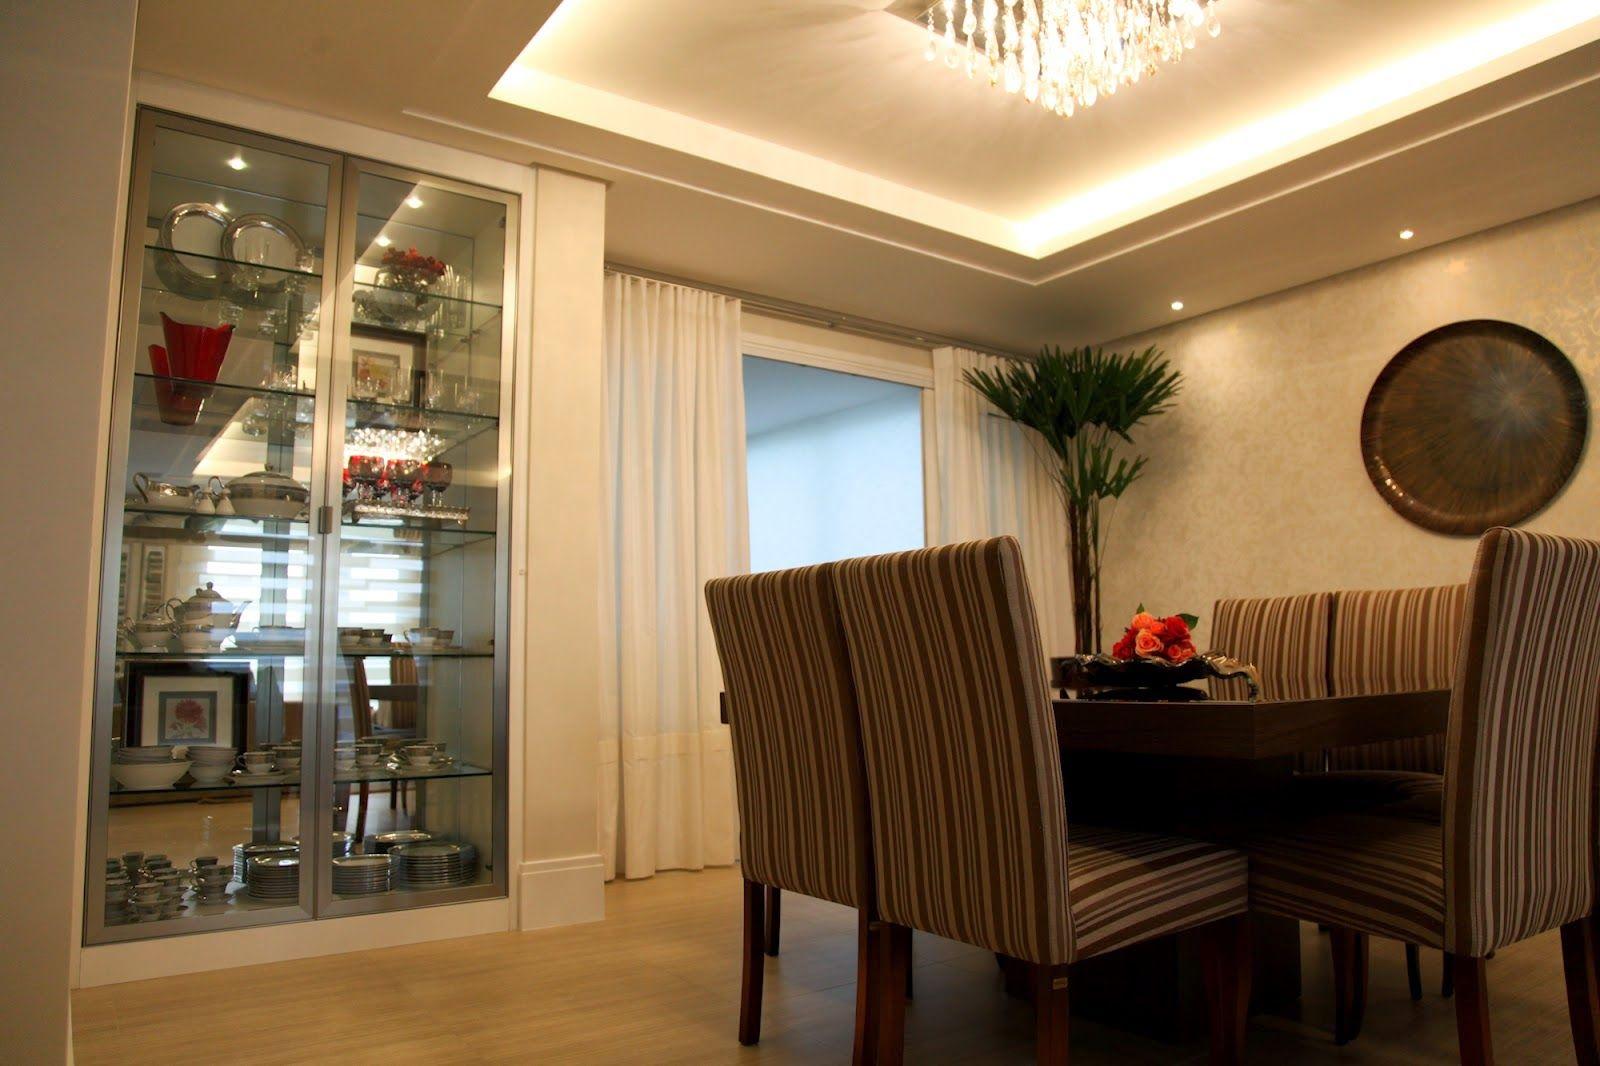 Sala De Jantar Decorada Lustre Embutido Decora O Pinterest  -> Lustres Para Sala De Apartamento Pequeno